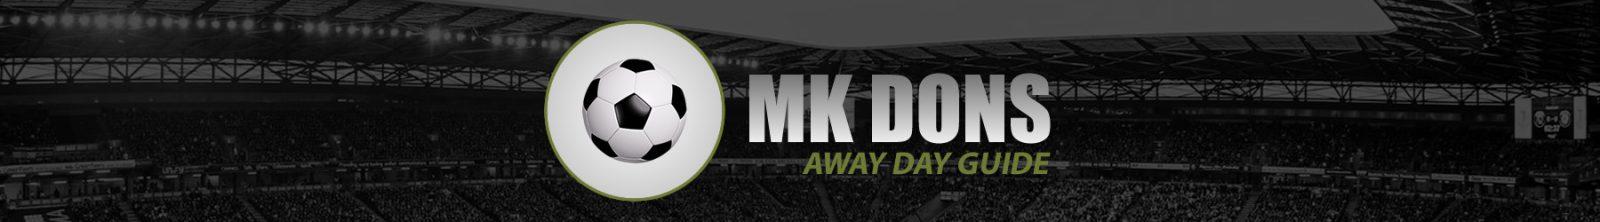 MK Dons Away